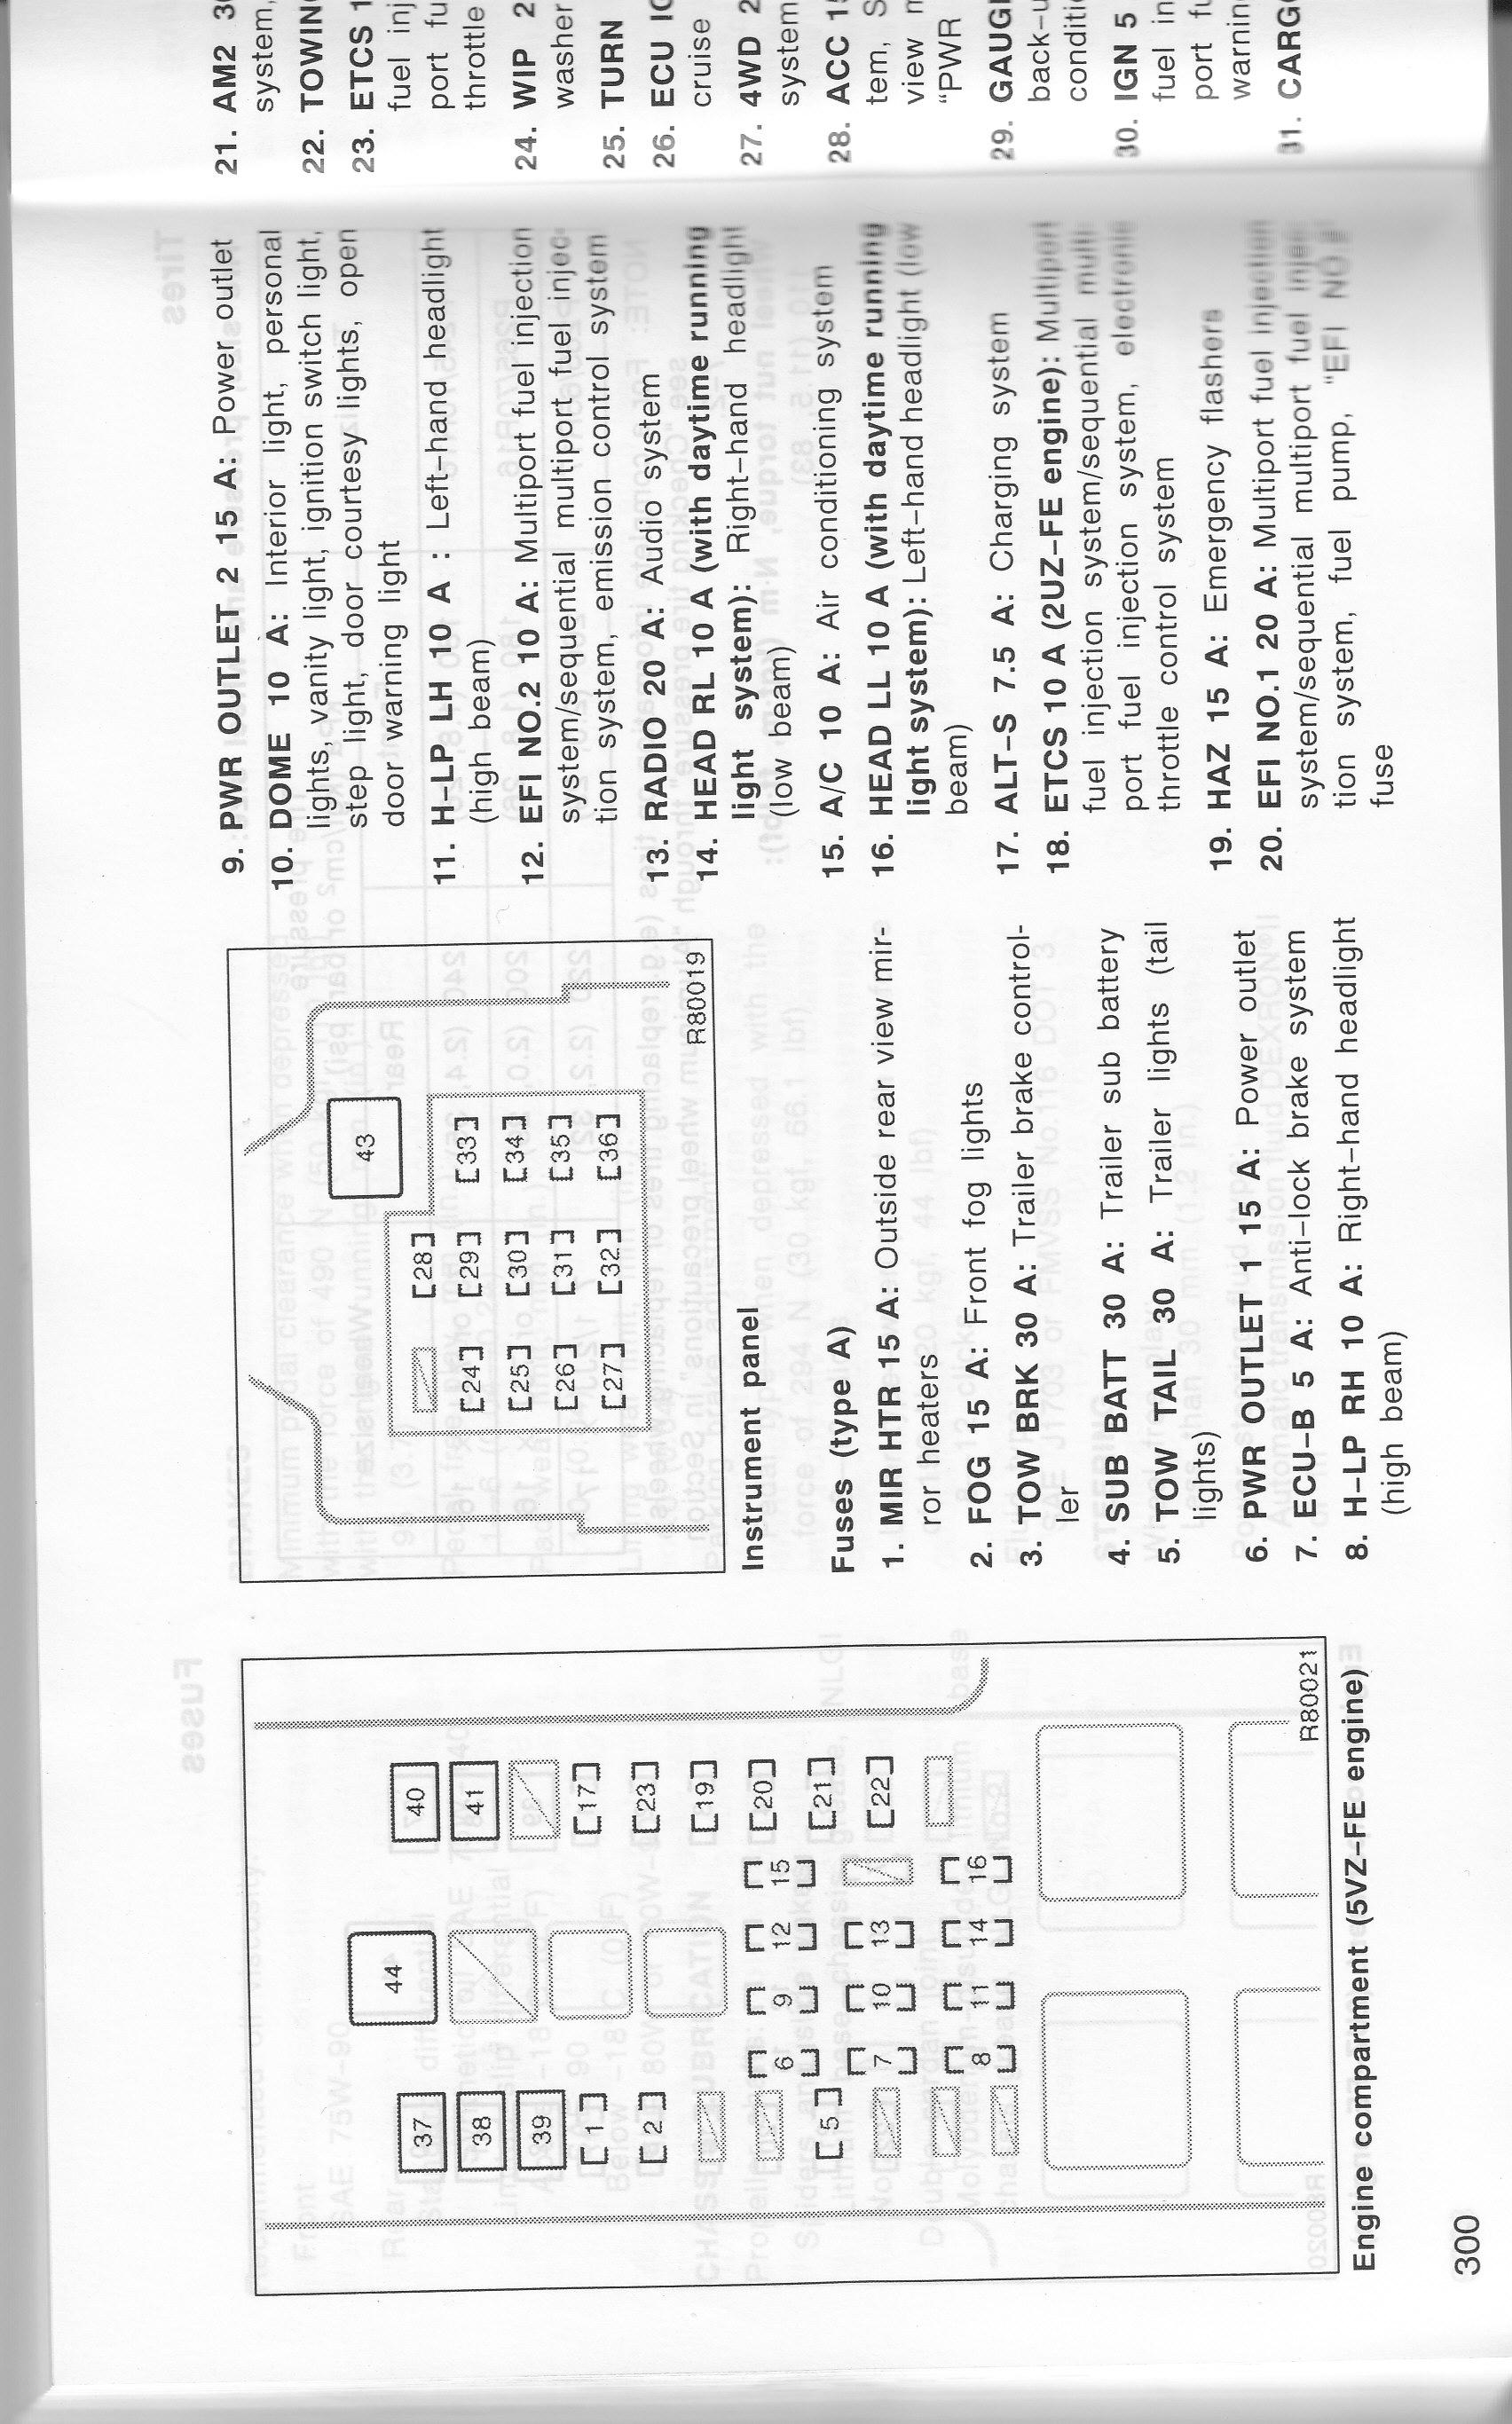 2016 toyota rav4 fuse box diagram